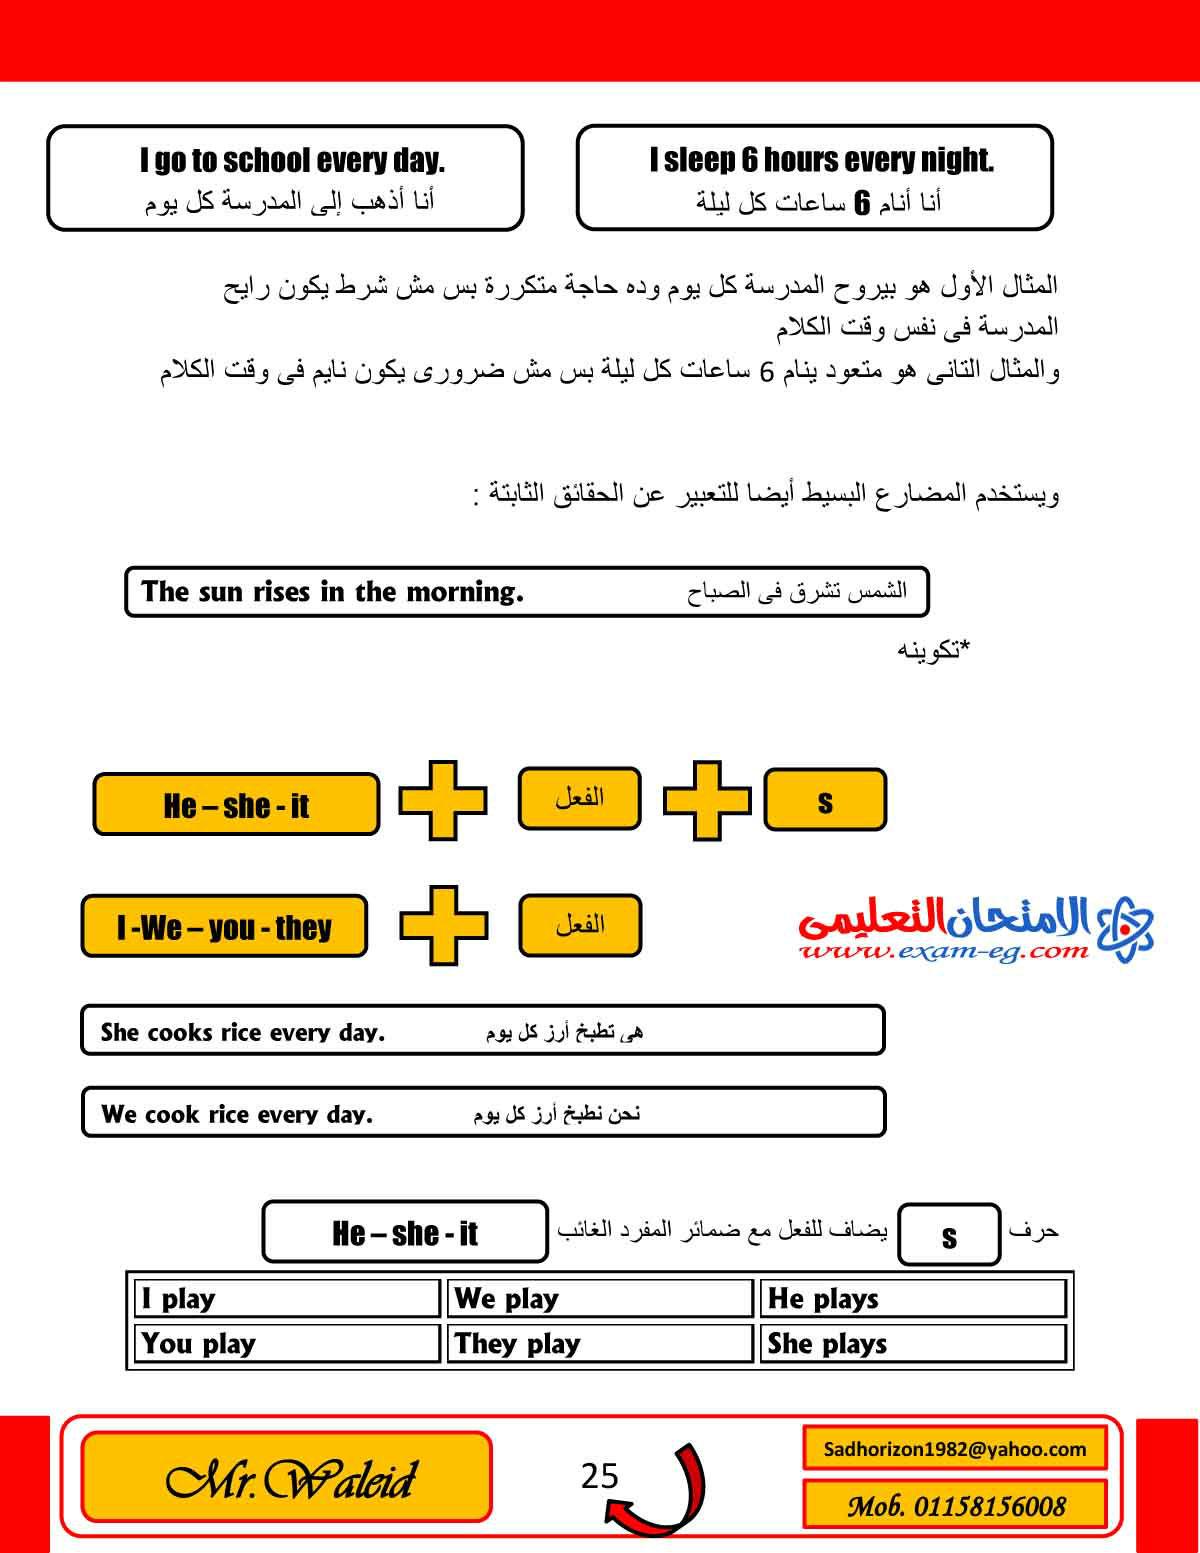 exam-eg.com_1449405428695.jpg